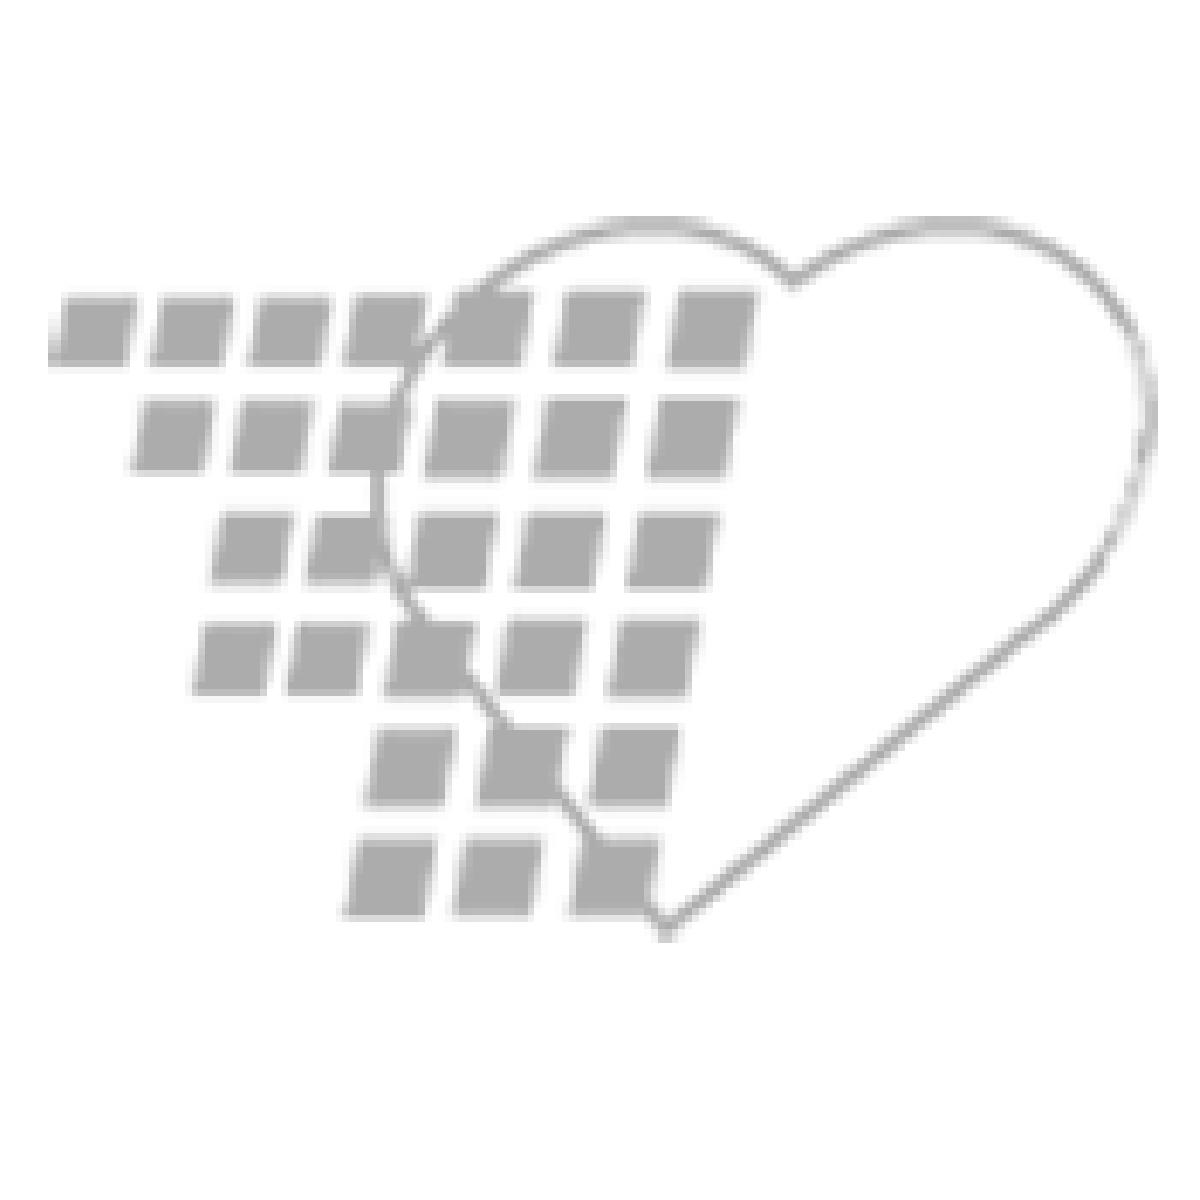 12-71-8316 - Laerdal Pocket Mask  in Polybag